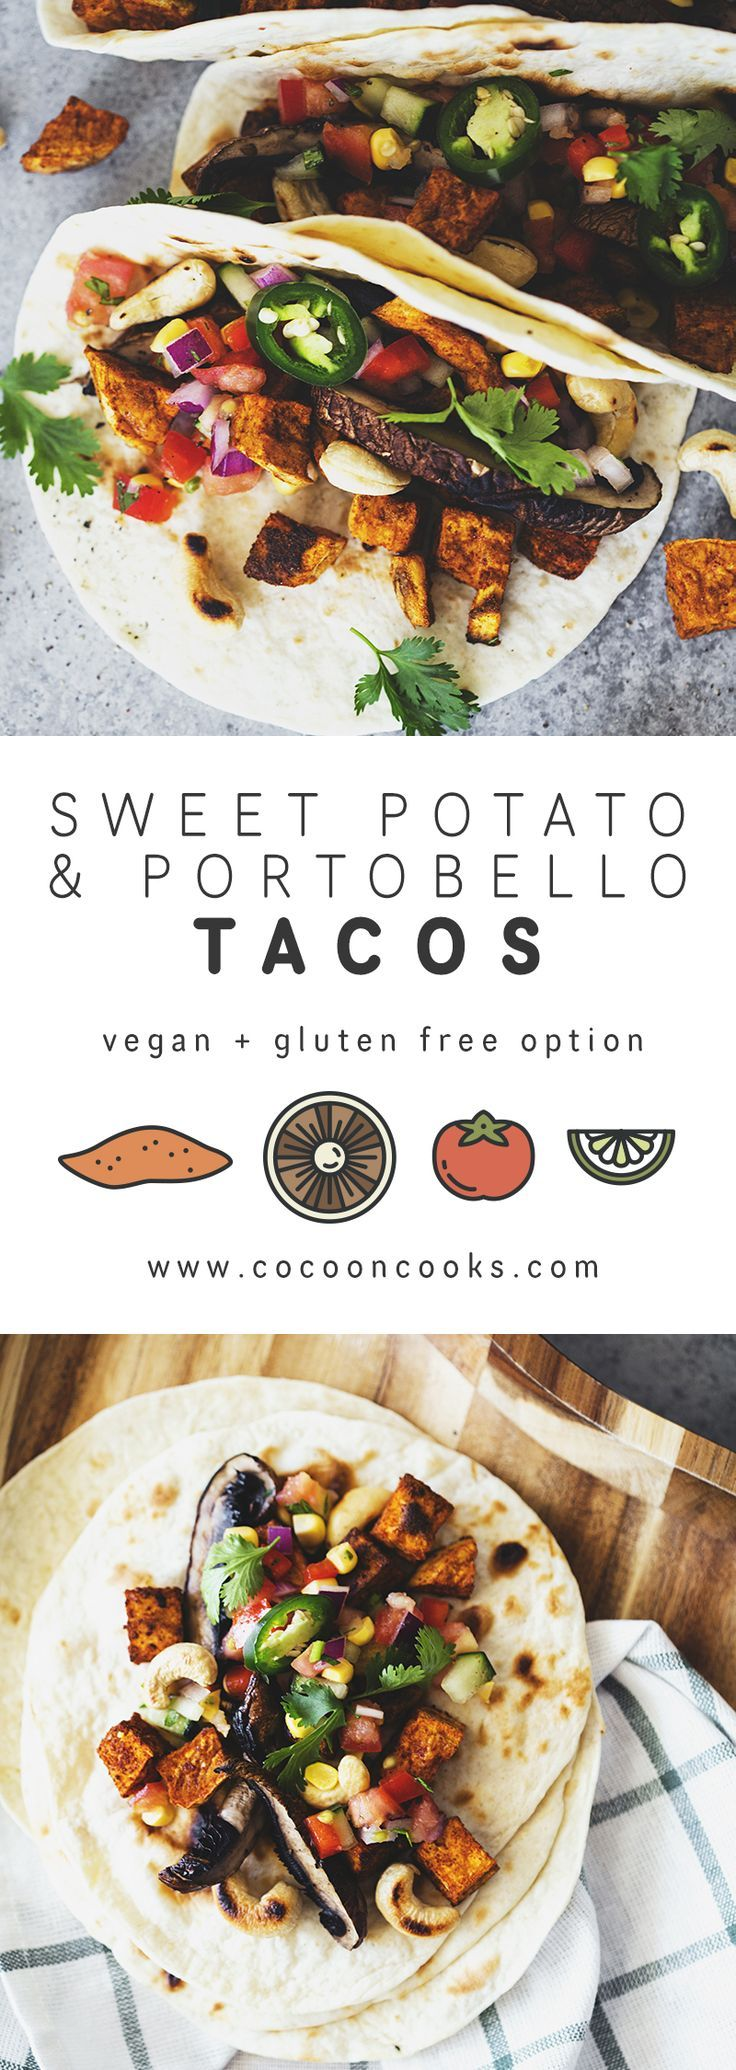 Spiced Sweet Potato & Grilled Portobello Tacos